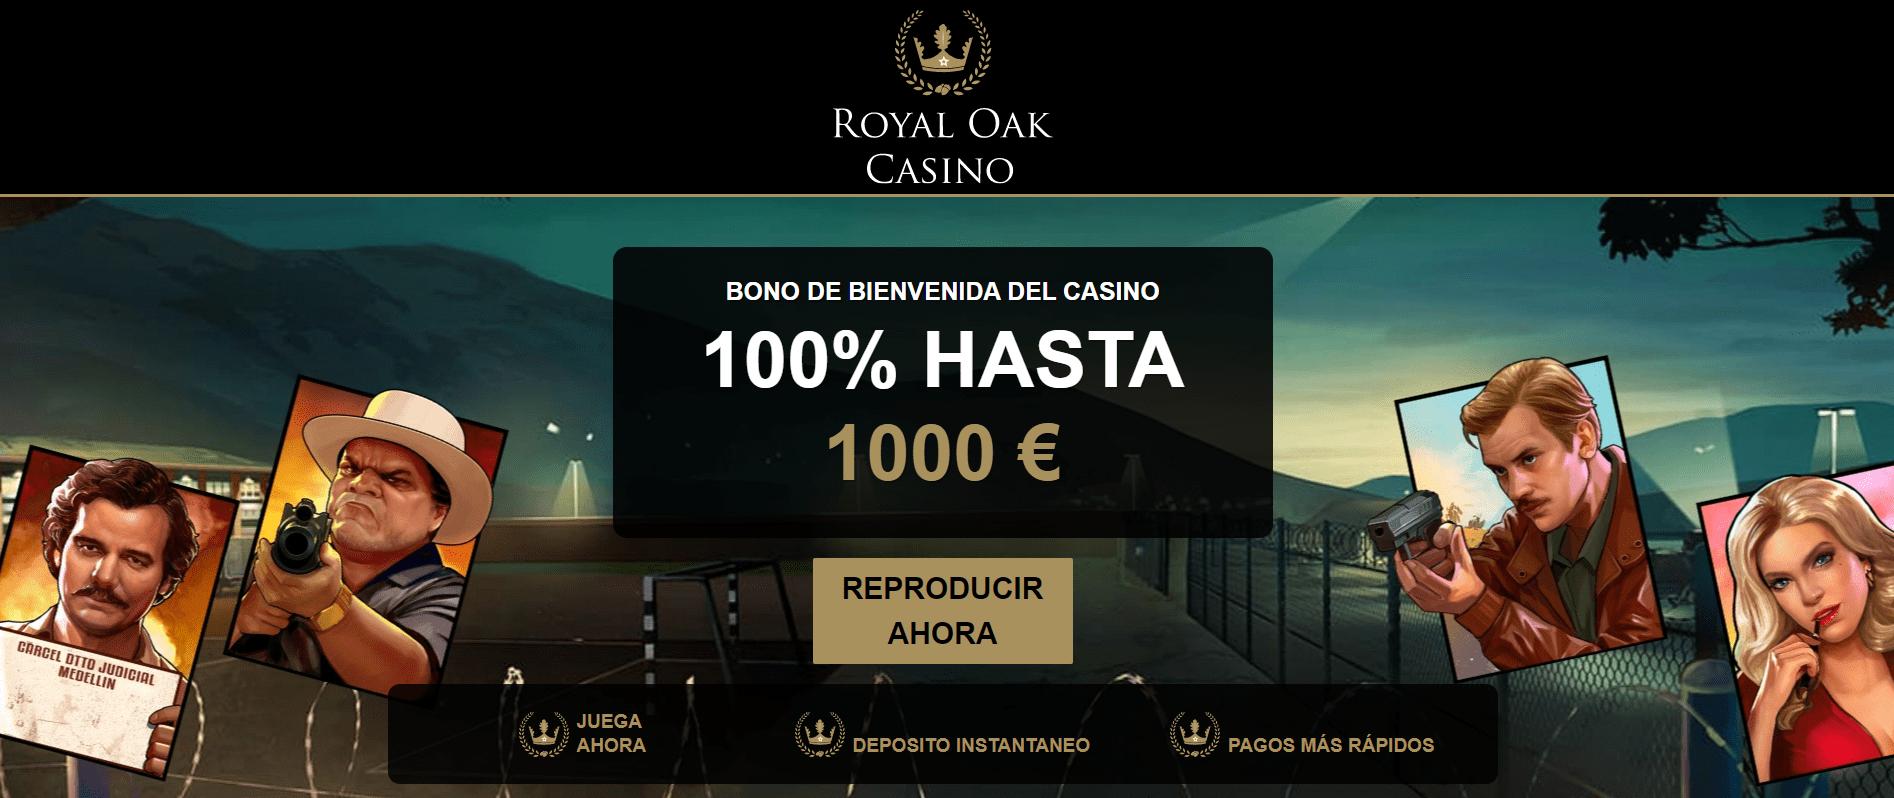 royal oak casino